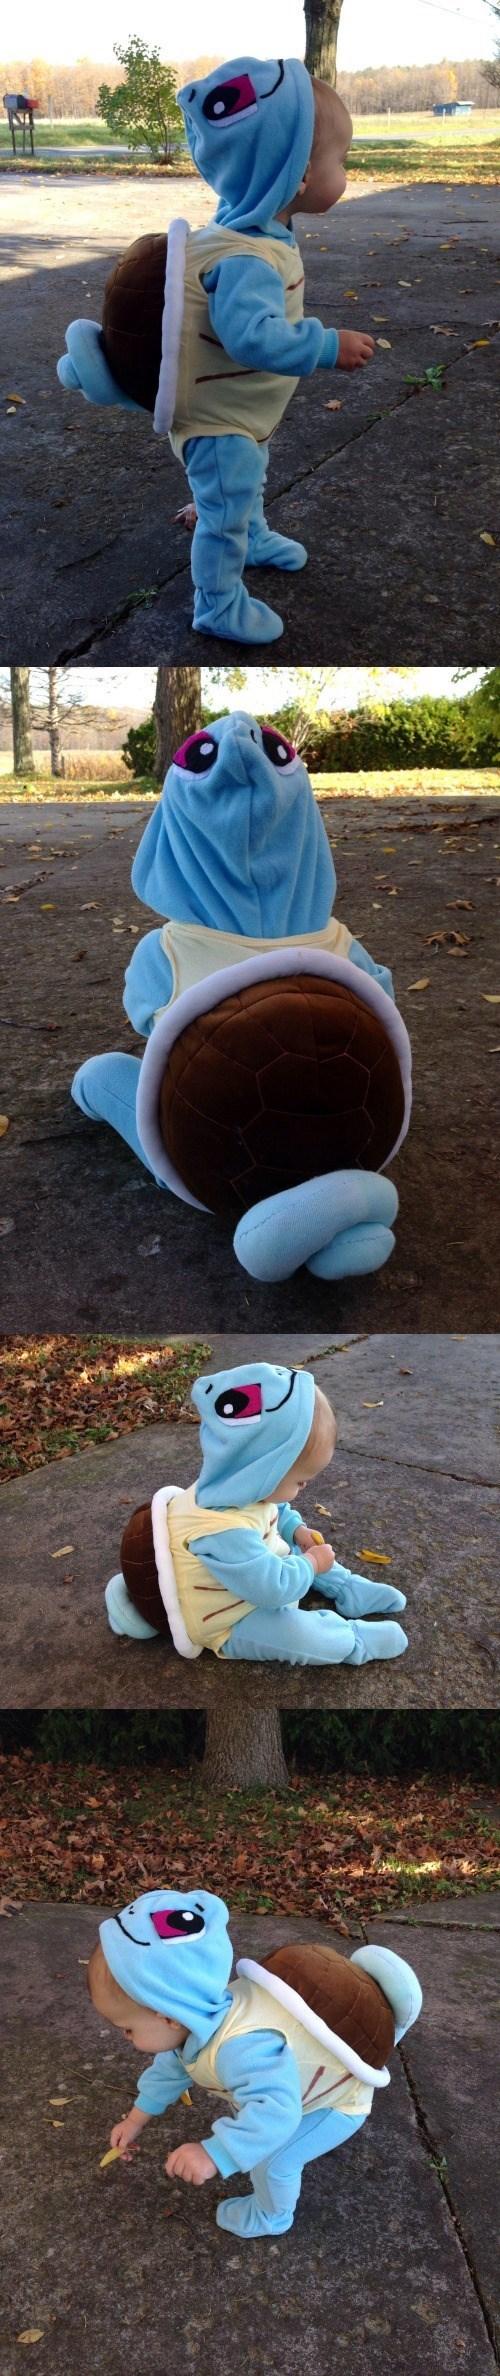 pokemon memes cute kid cosplay squirtle